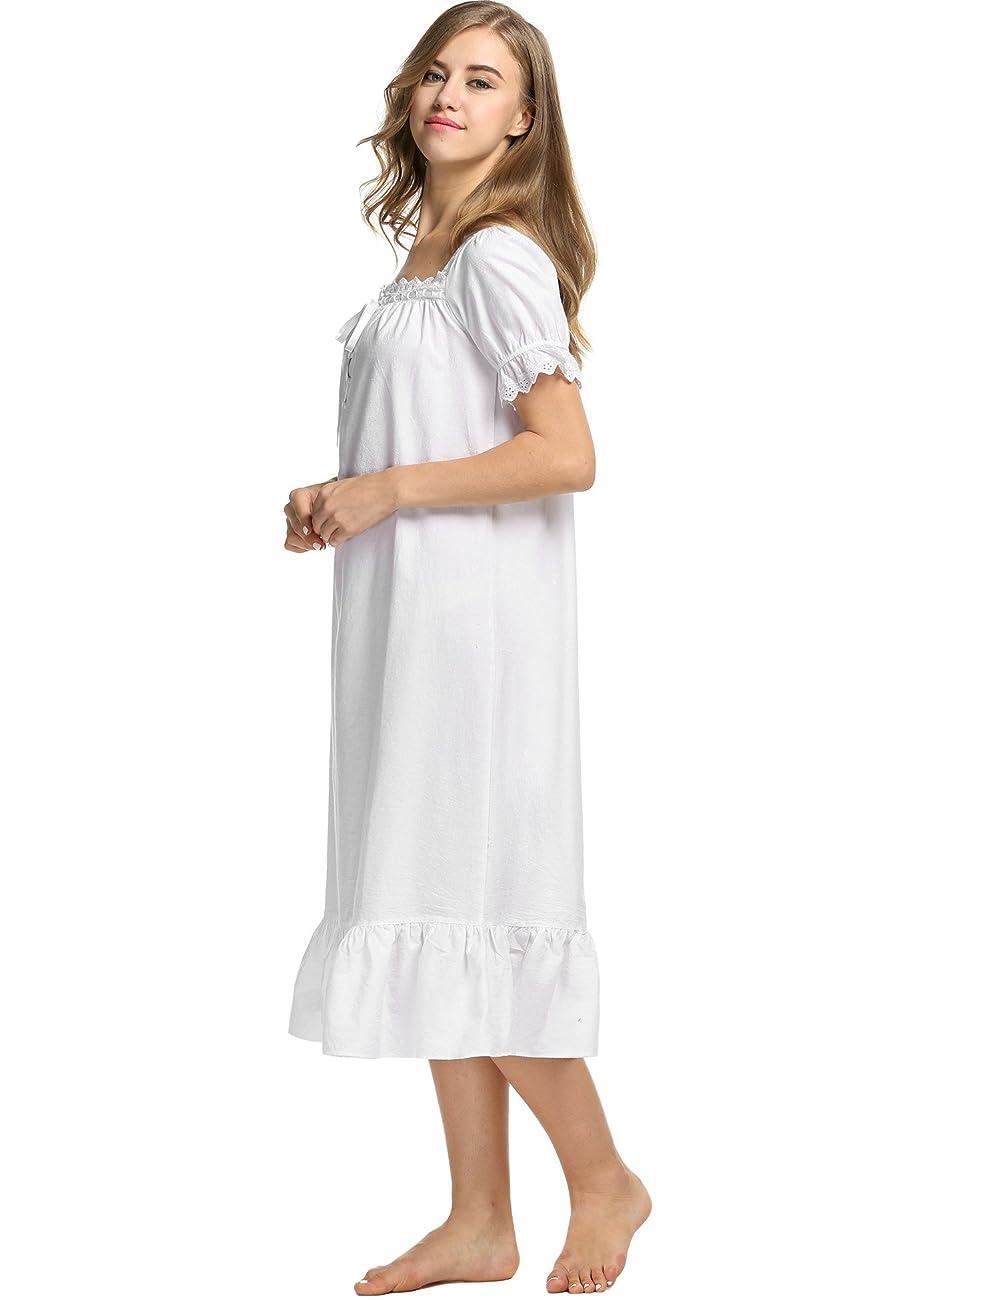 Avidlove Womens Cotton Victorian Vintage Short Sleeve Nightgown Sleepwear 2